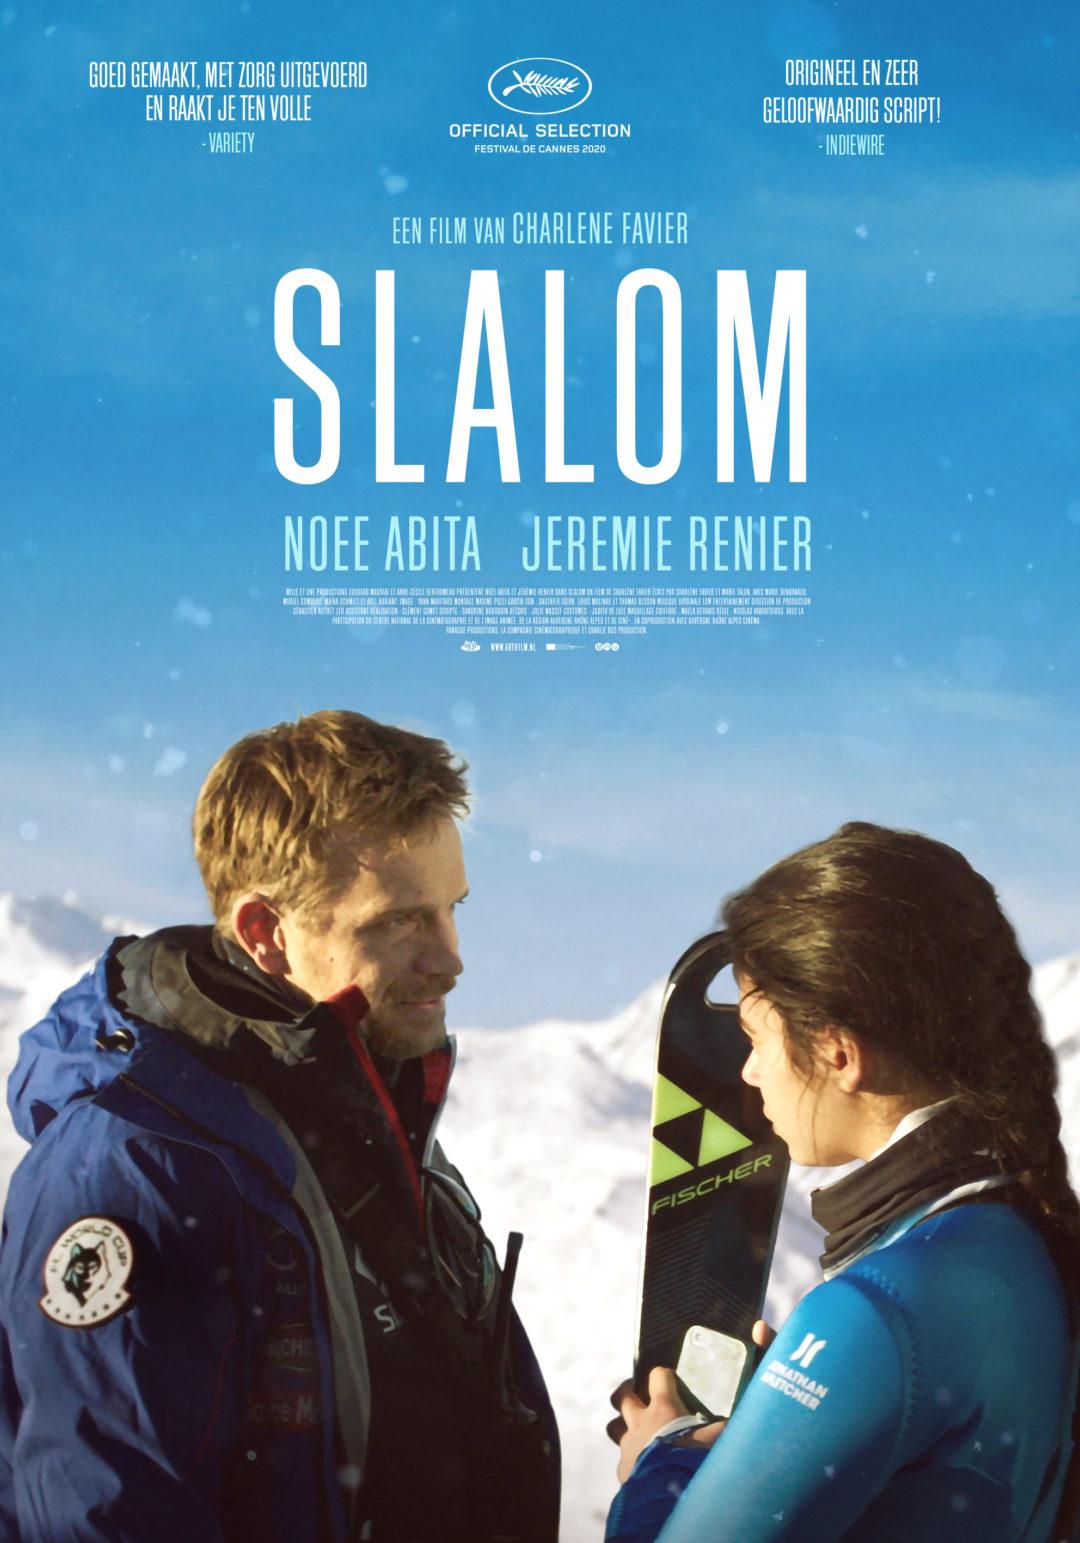 Slalom_ps_1_jpg_sd-high.jpg